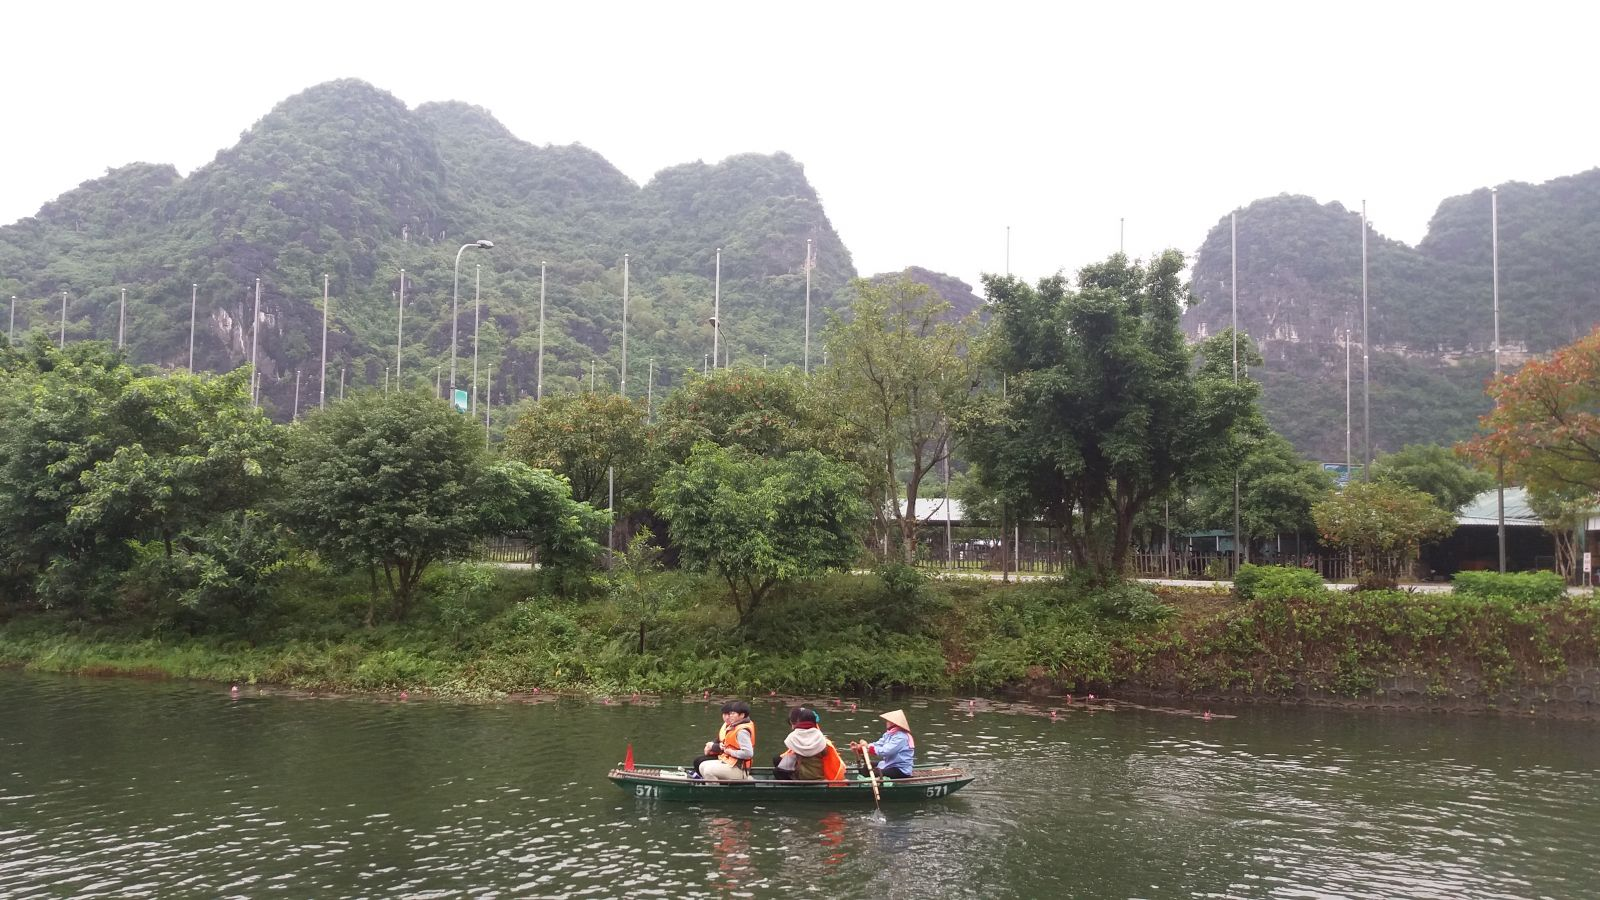 Ninh Binh day tour to Trang An